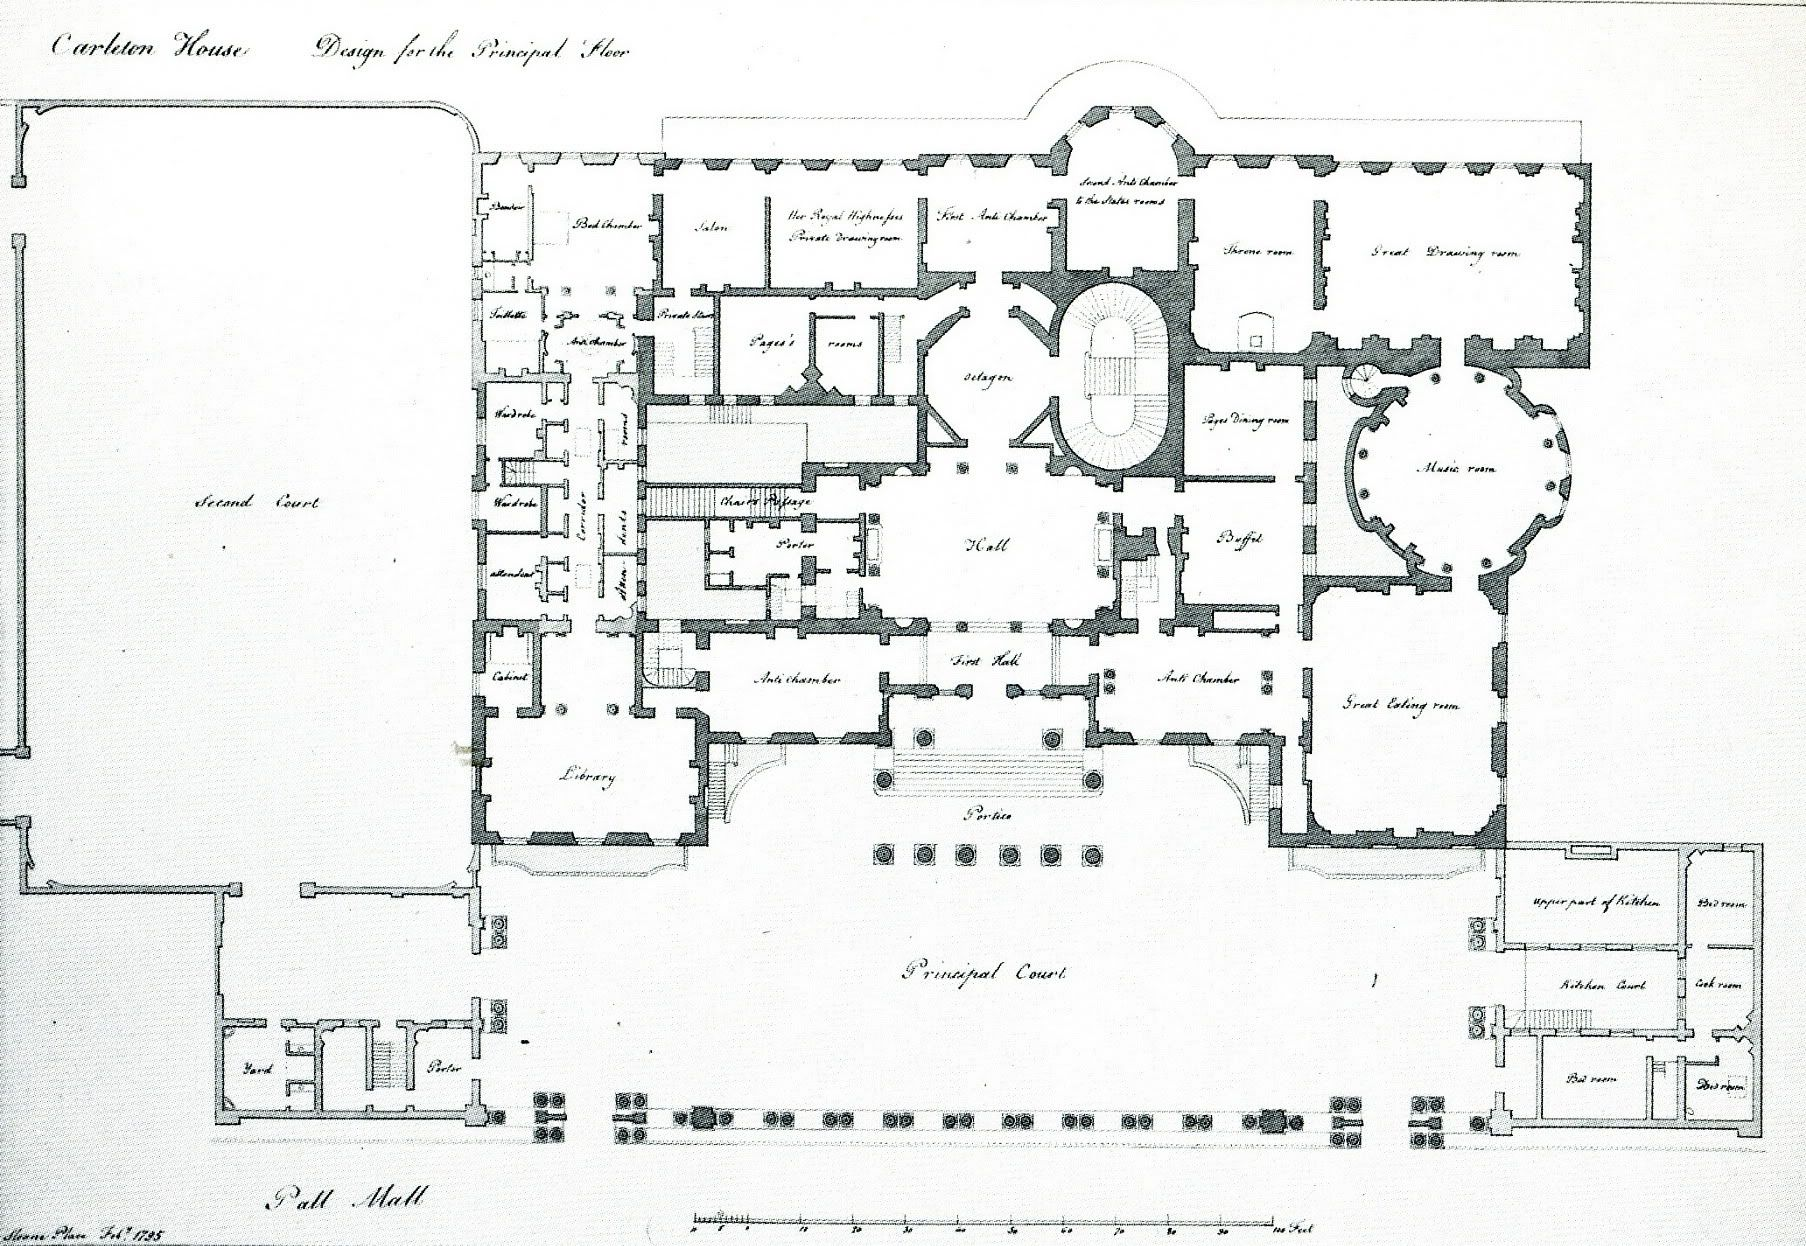 Carlton House London A Virtual Tour Of The Entrance Rooms